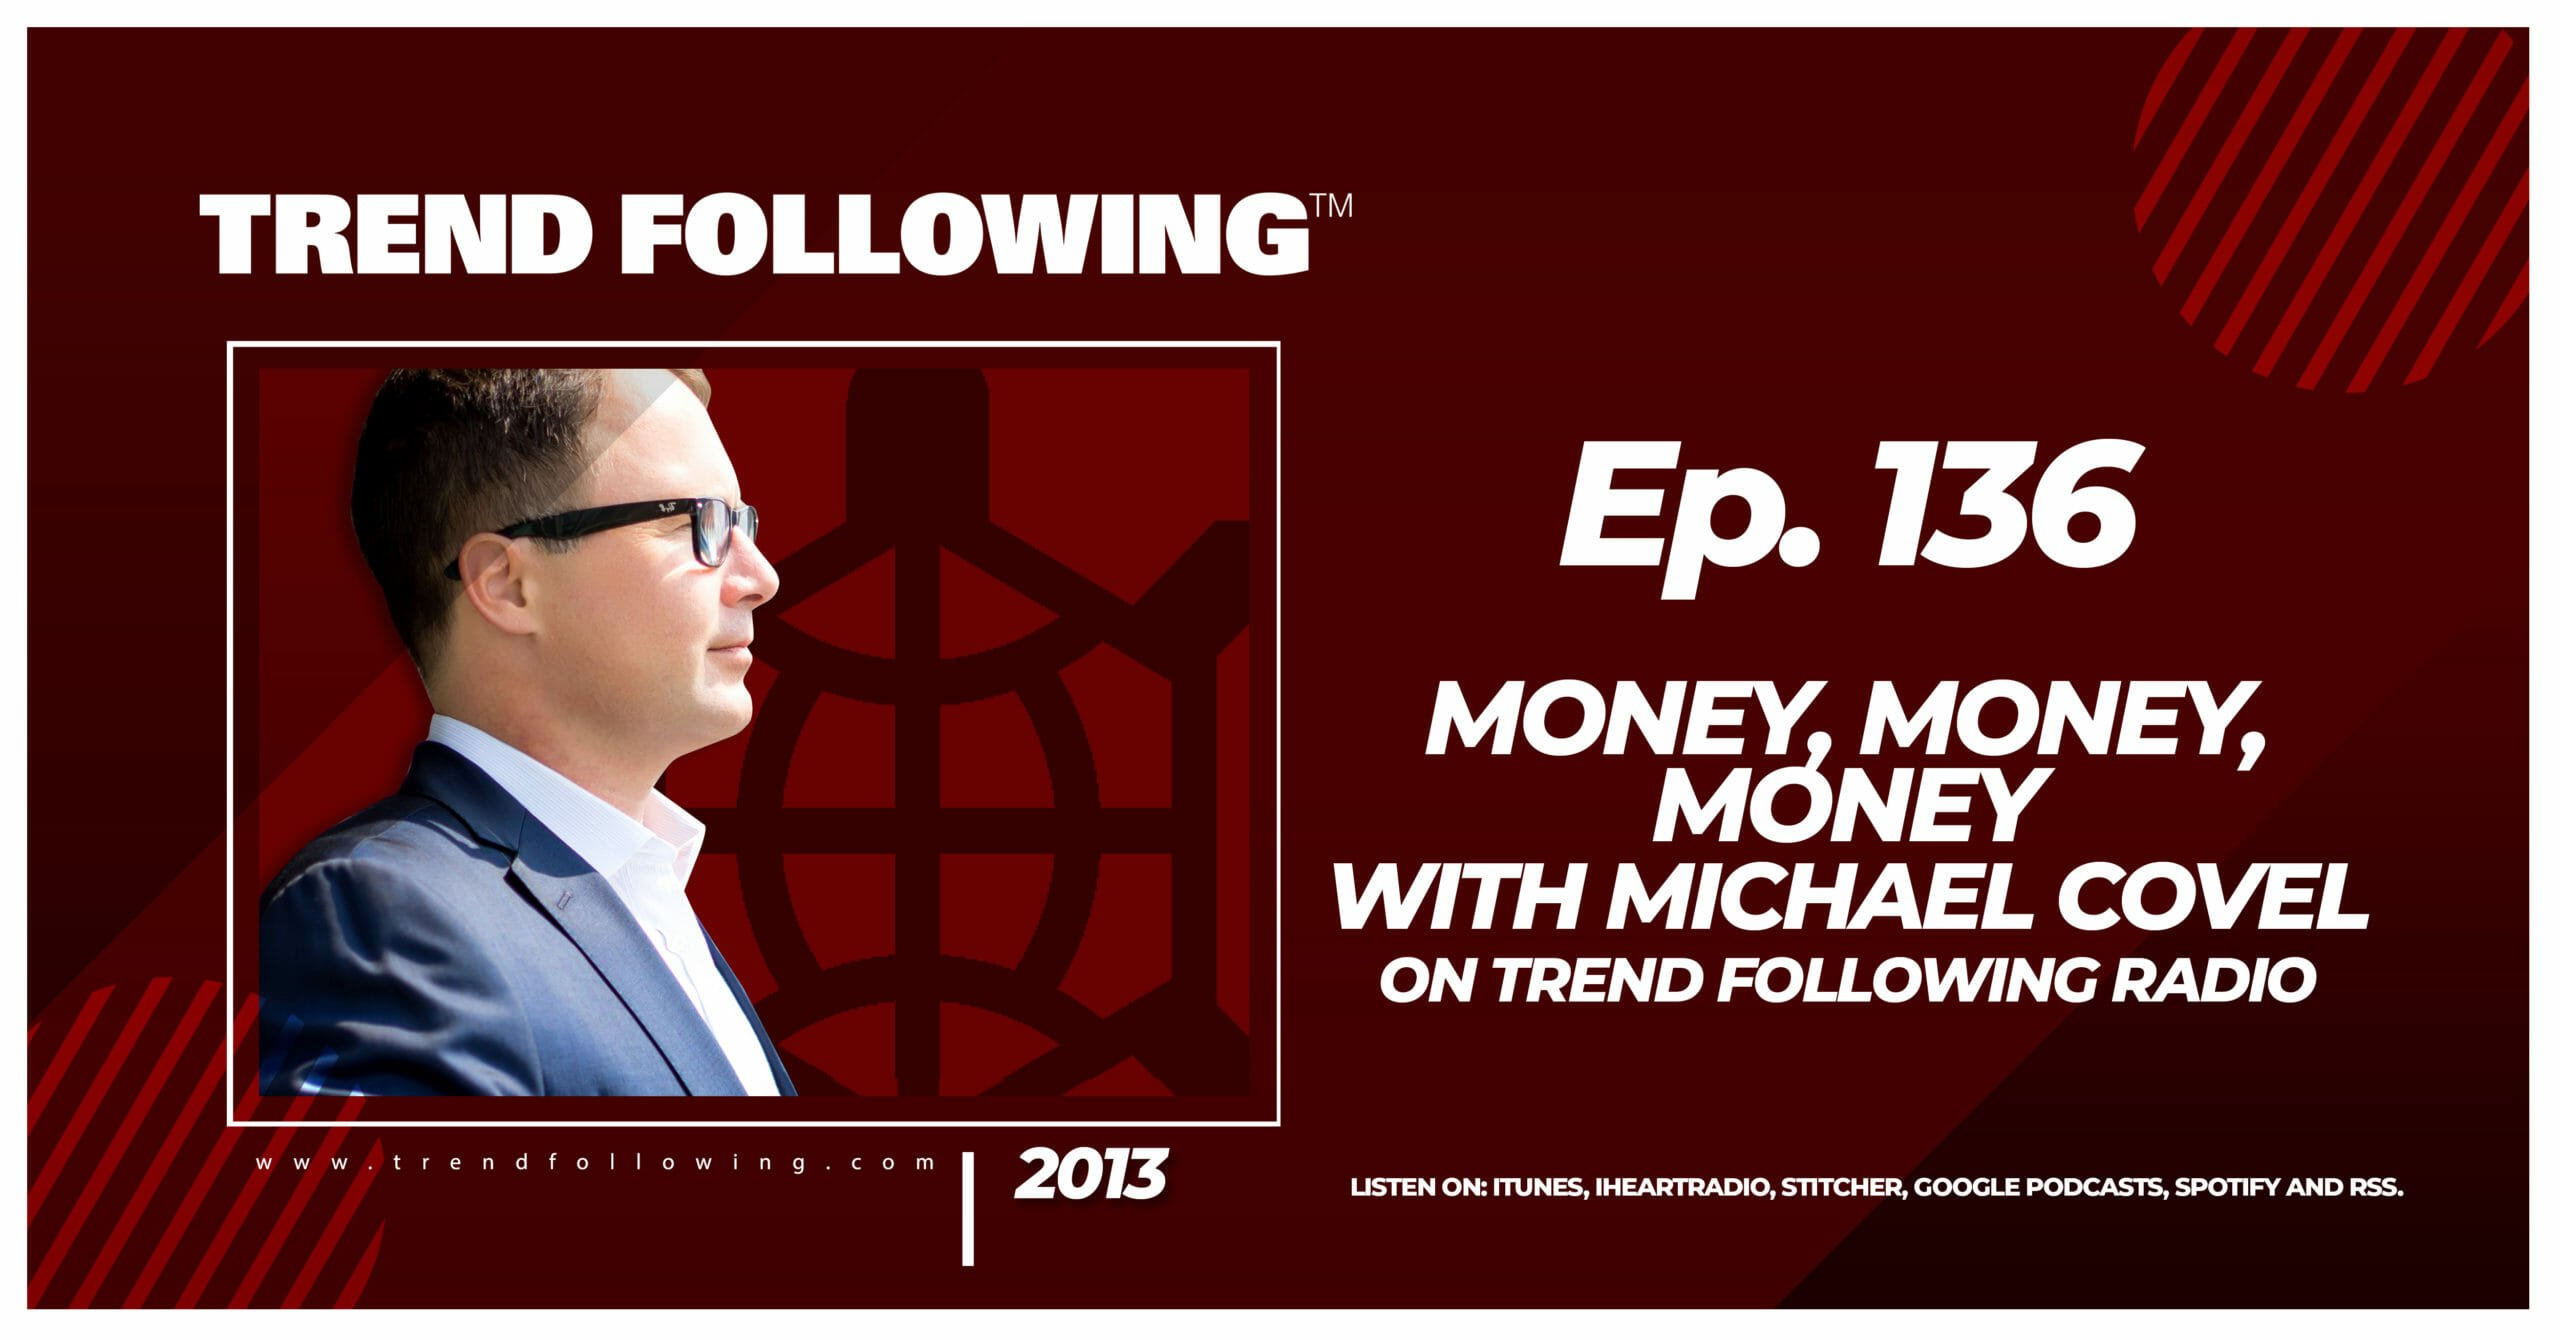 Money, Money, Money with Michael Covel on Trend Following Radio